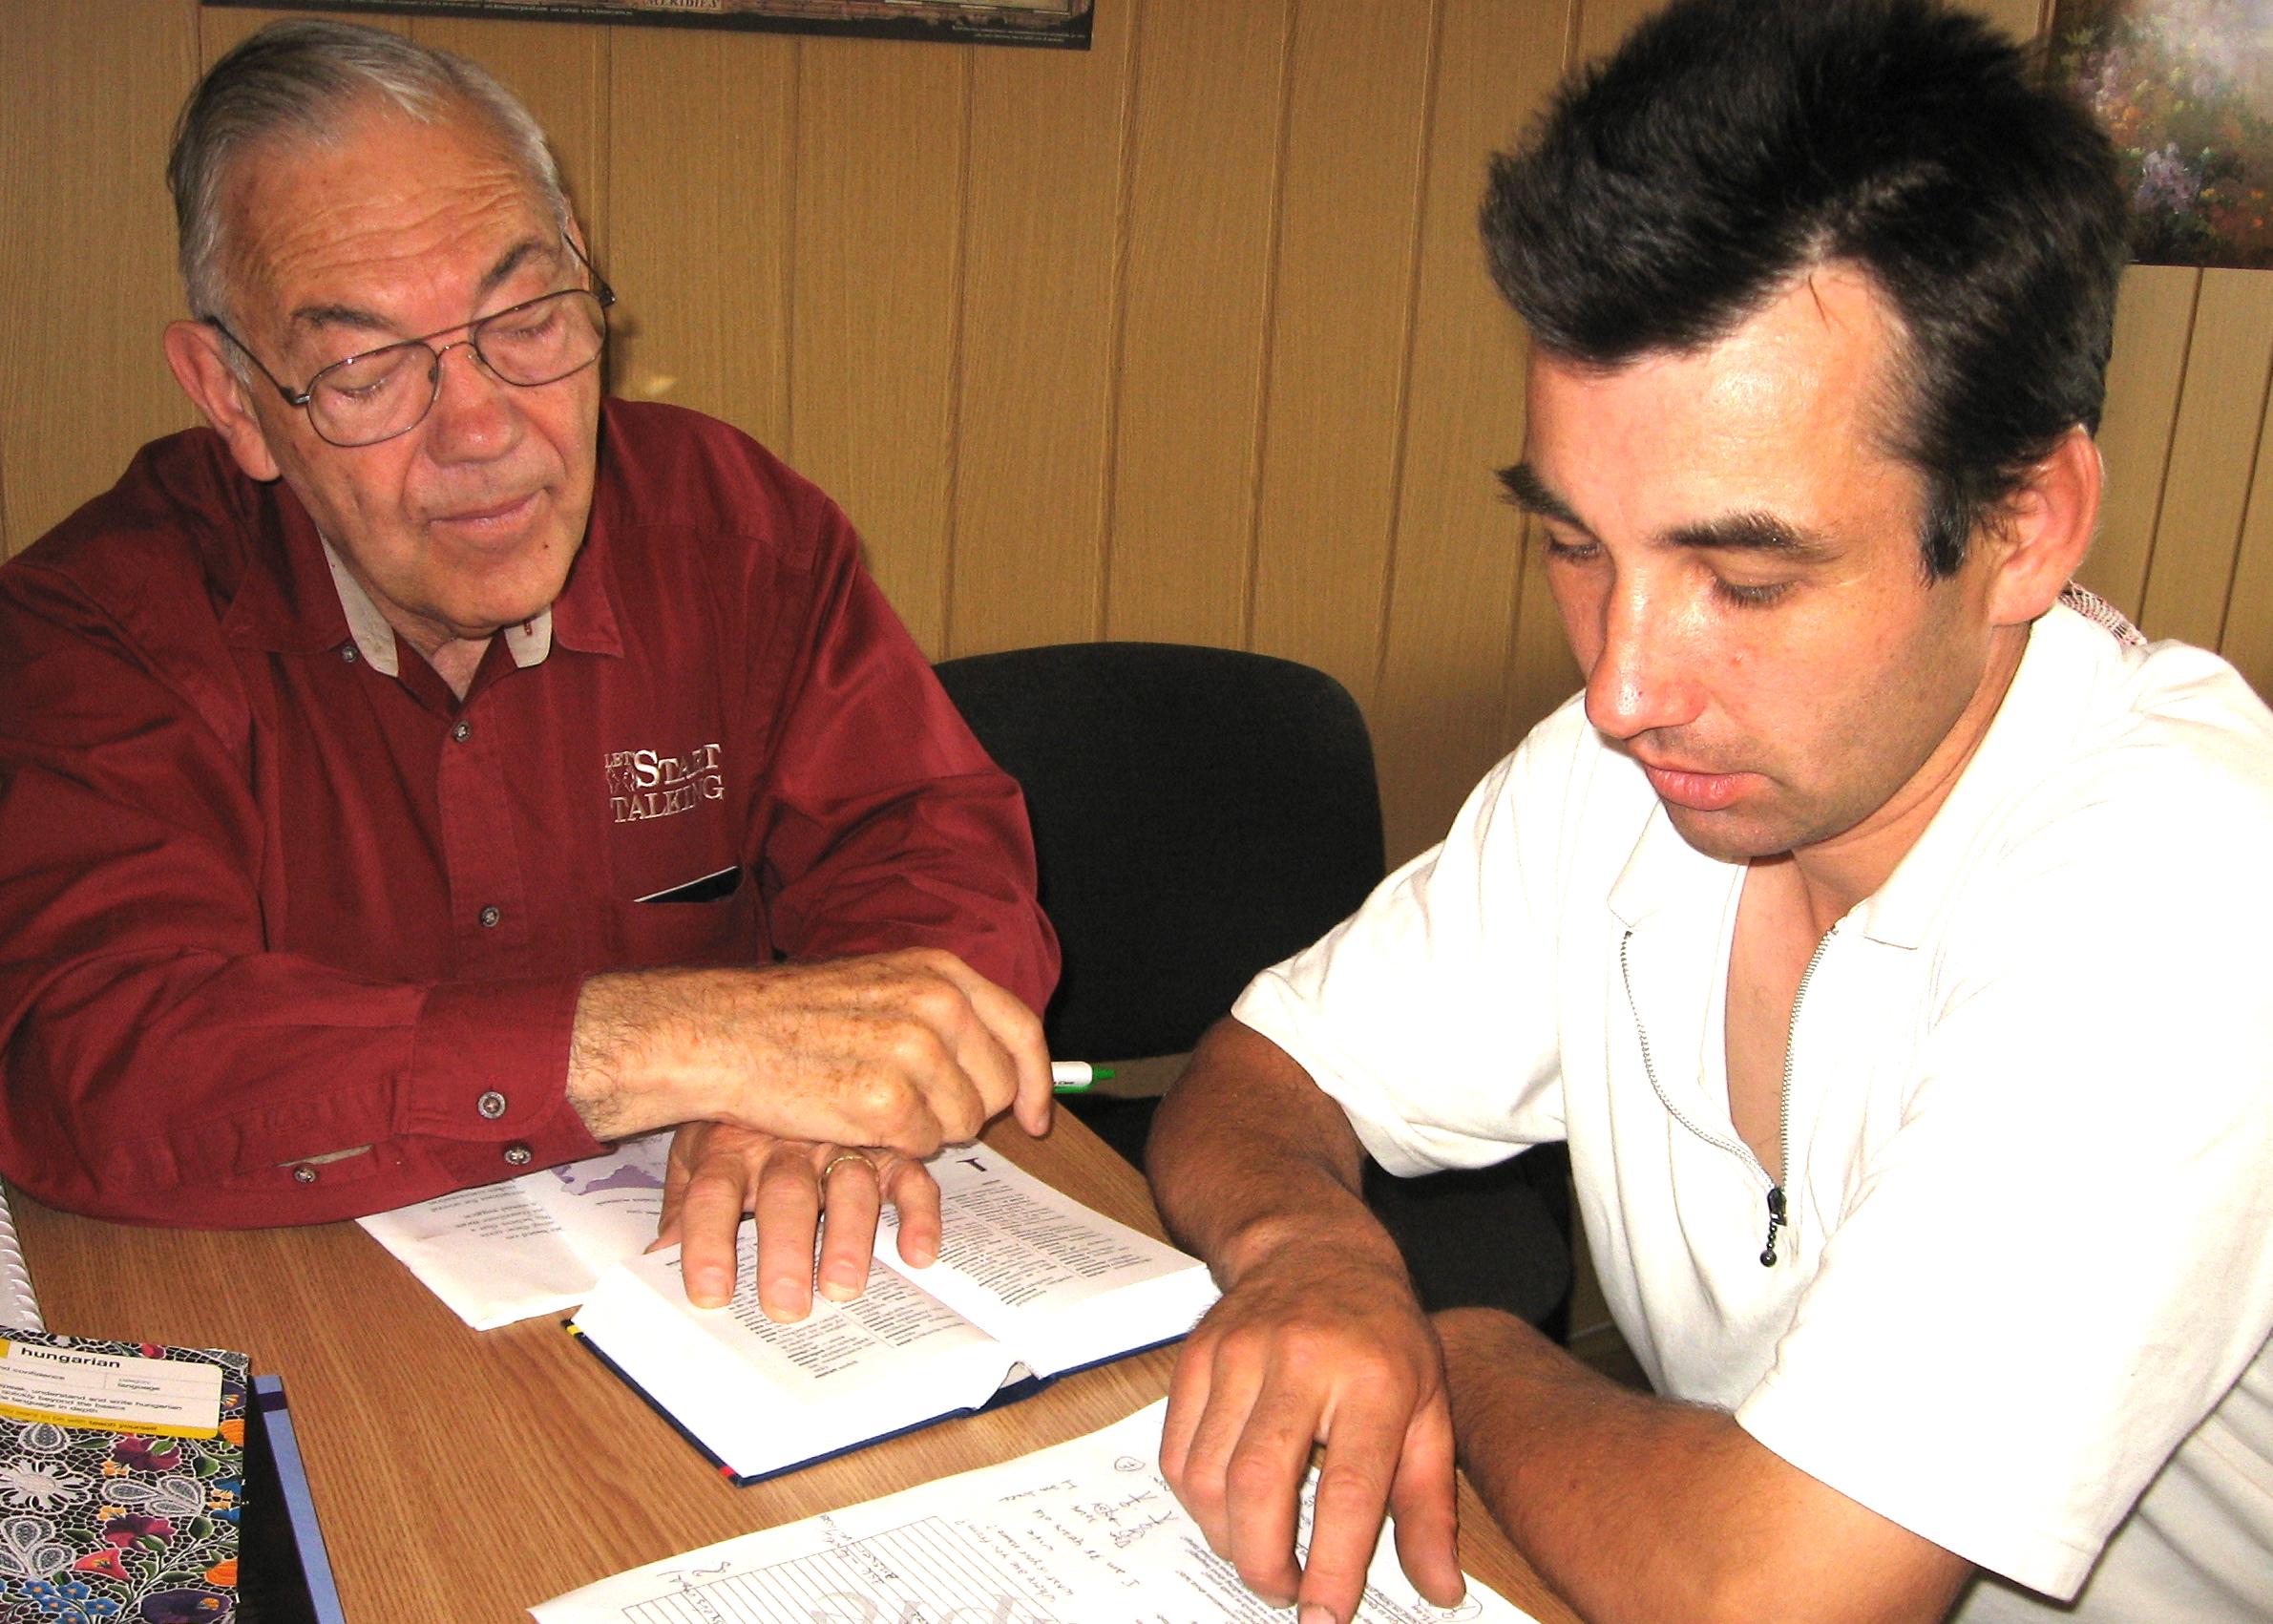 Dan & Josef Studied Together in Sfantu Gheorghe, RO